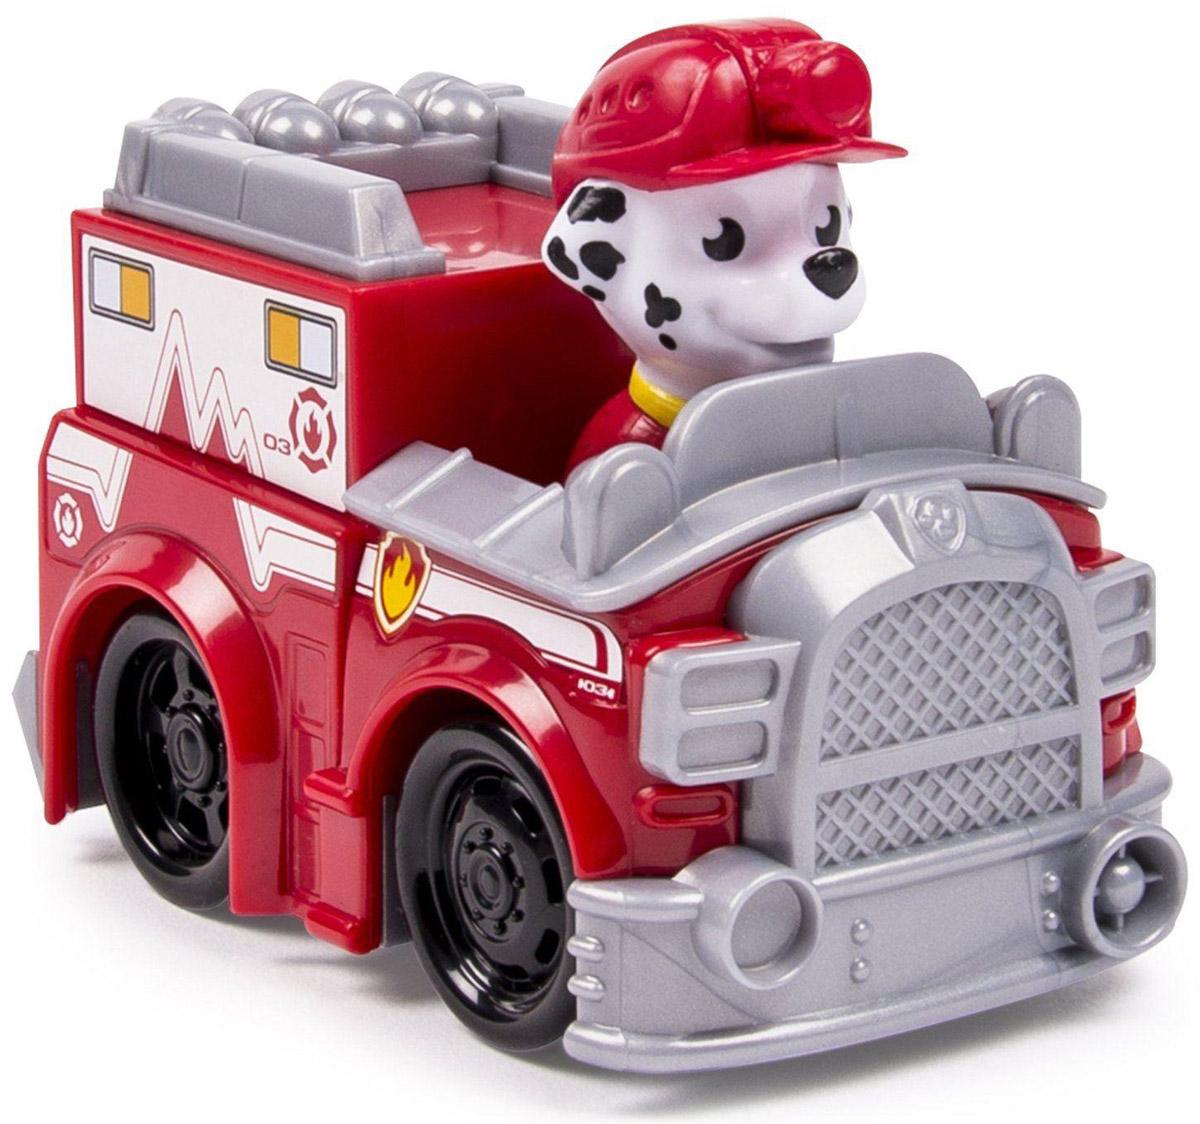 Paw Patrol Машинка спасателя Marshall пламенный мотор машинка инерционная volvo пожарная охрана